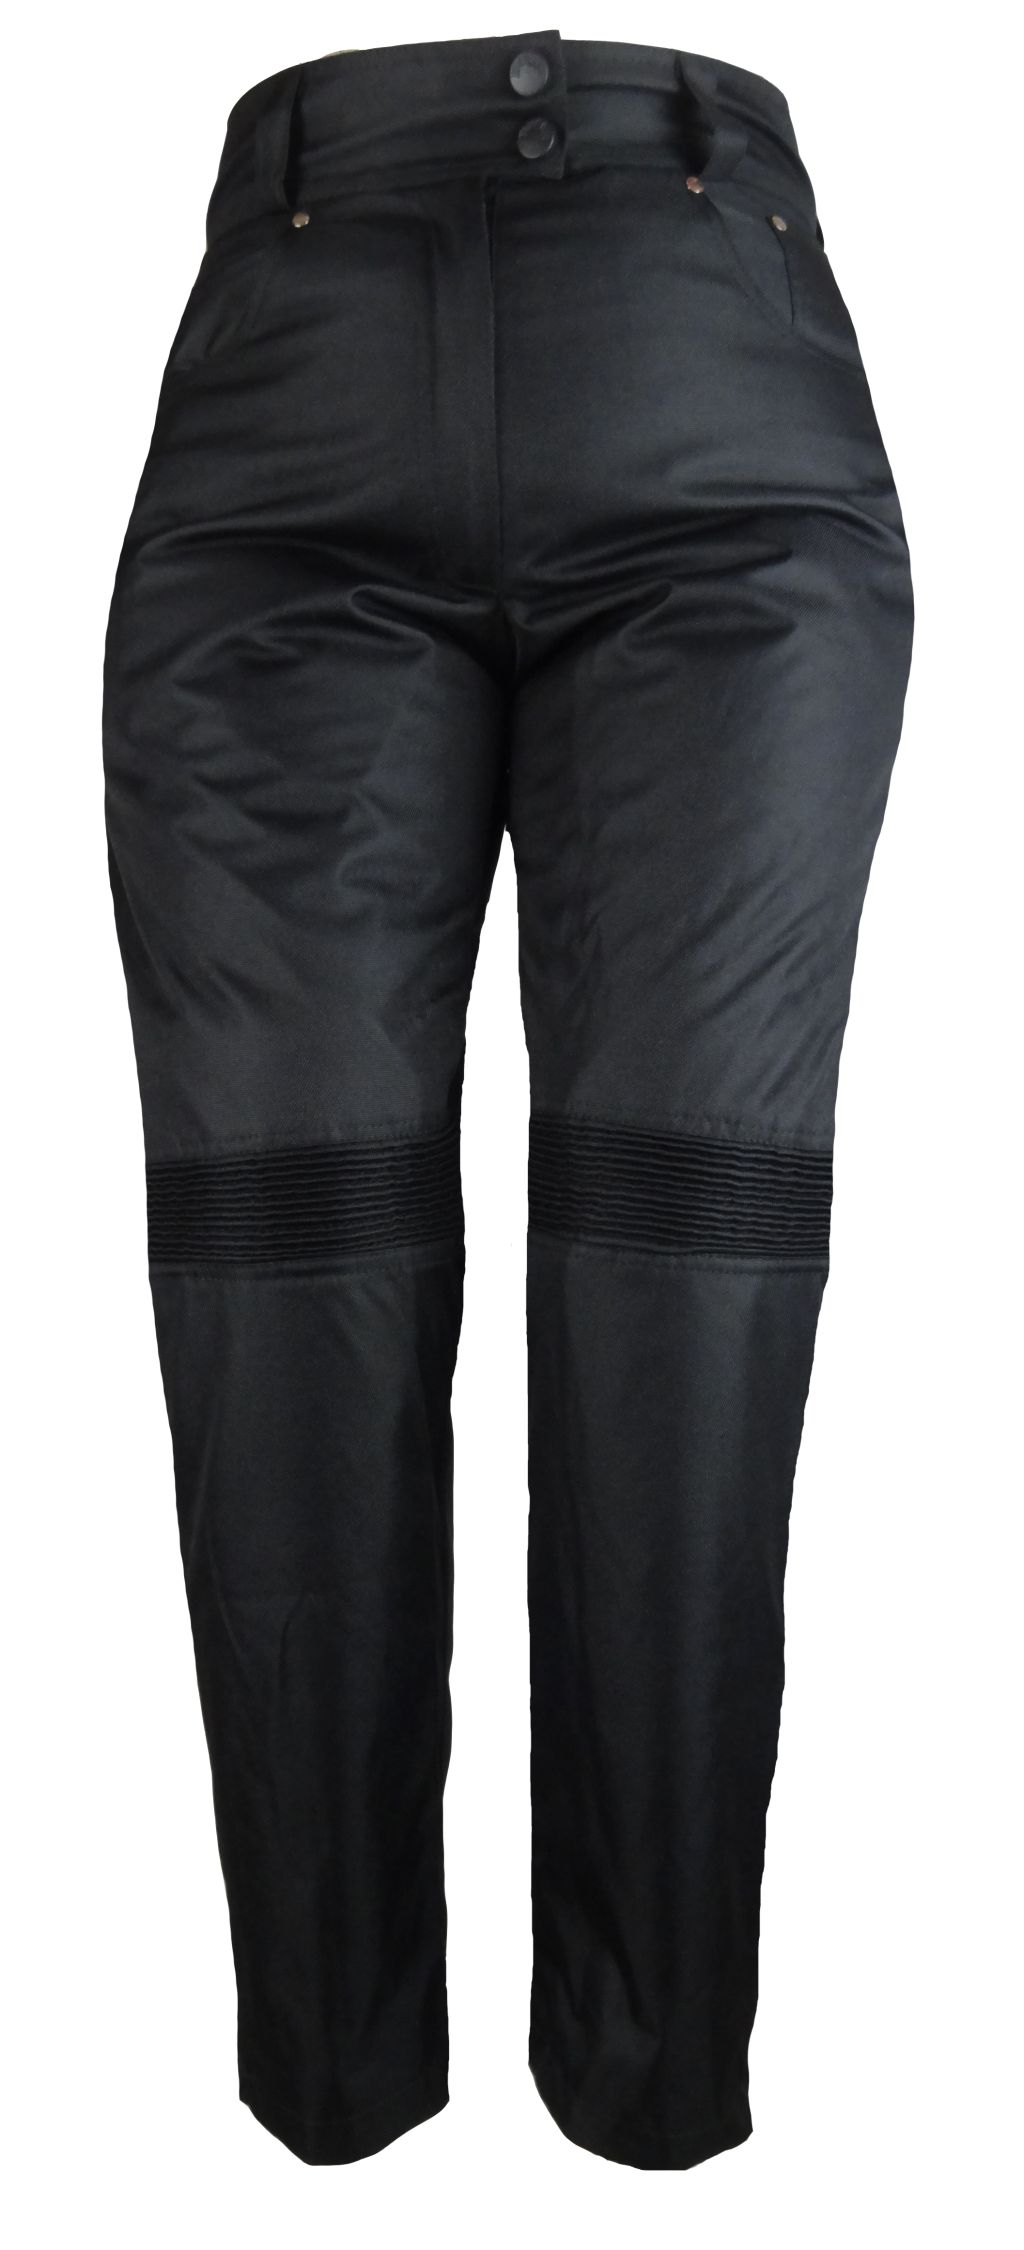 damen motorrad hose schwarz im jeans look motorradhose s m. Black Bedroom Furniture Sets. Home Design Ideas